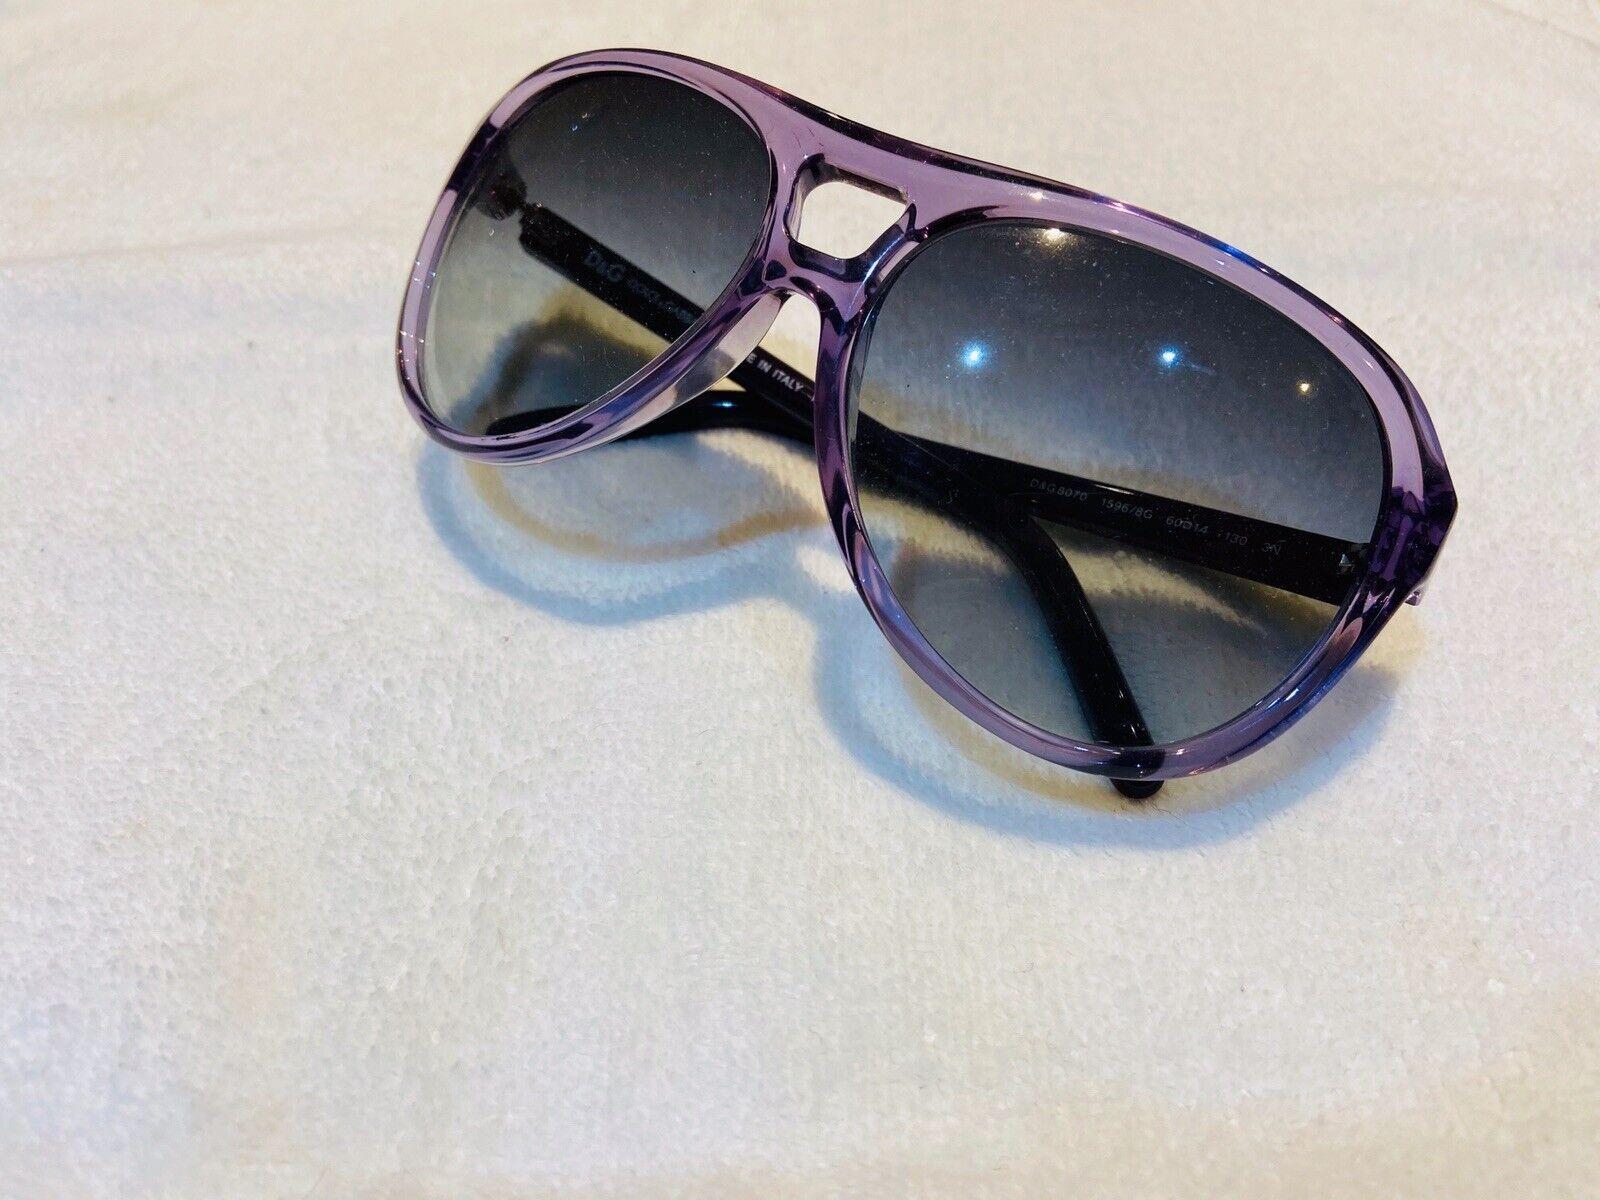 Dolce & Gabbana Purple Women's Aviator Sunglasses Italy - Amazing Condition